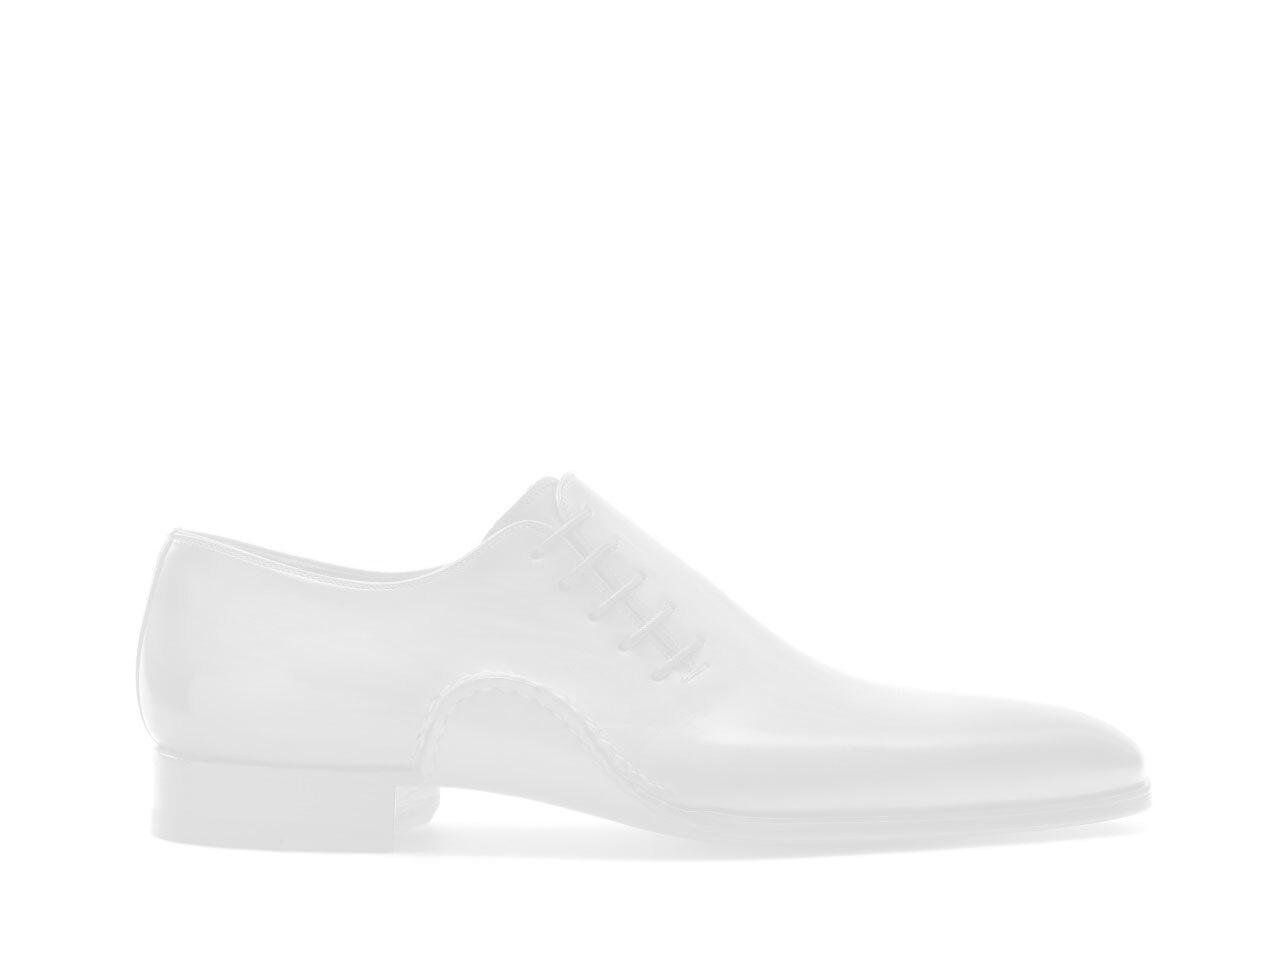 Pair of the Magnanni Orbada Cognac Men's Sneakers